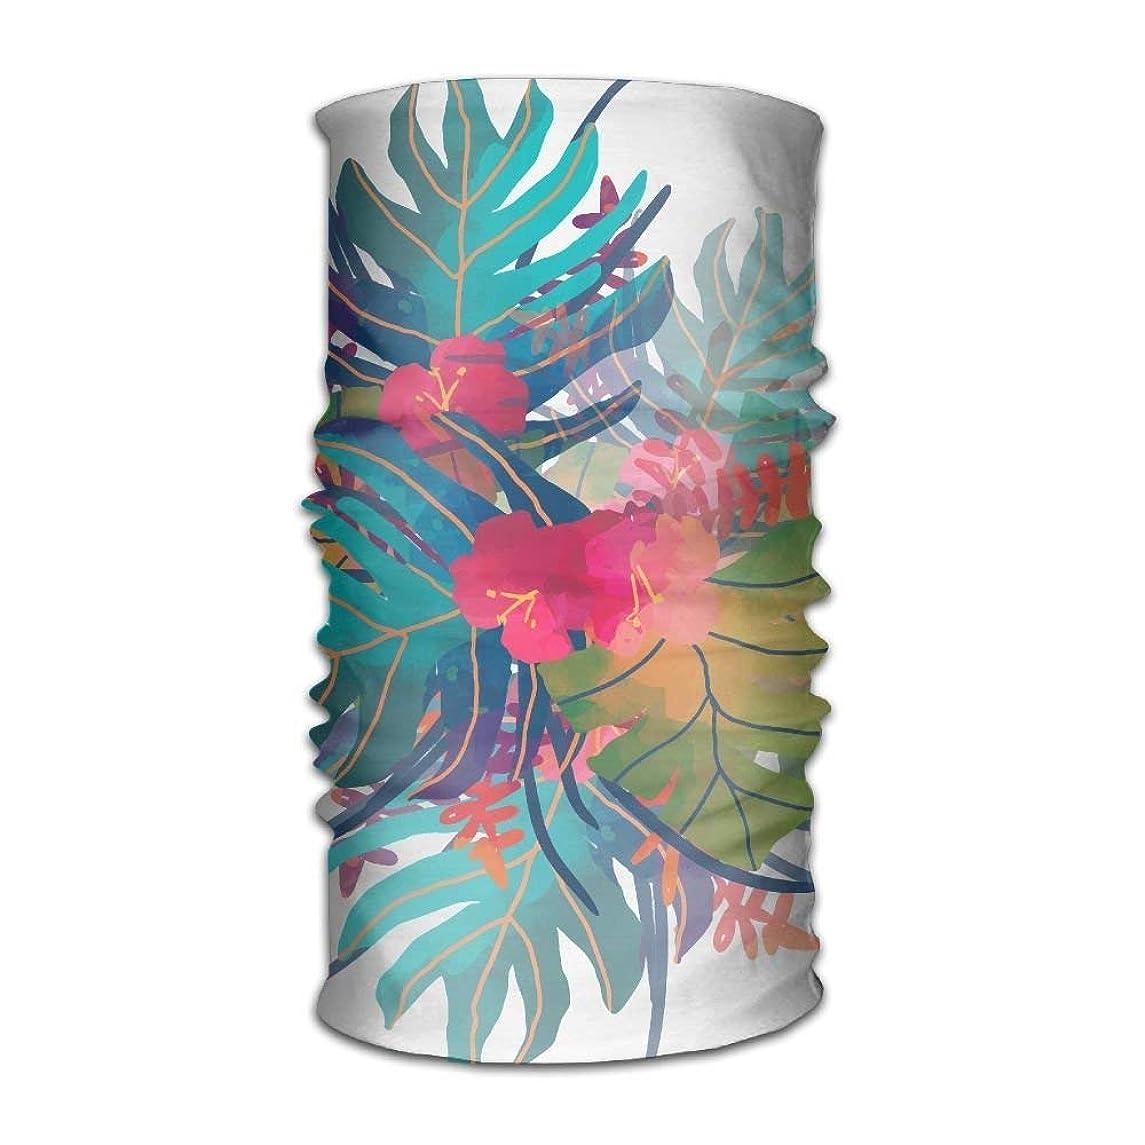 Men Women Customize Headbands Watercolor Tropical Plants Seamless Outdoor Sport Workout Yoga Magic Multifunctional Headscarves Bandanas Face Wraps Neck Gaiter